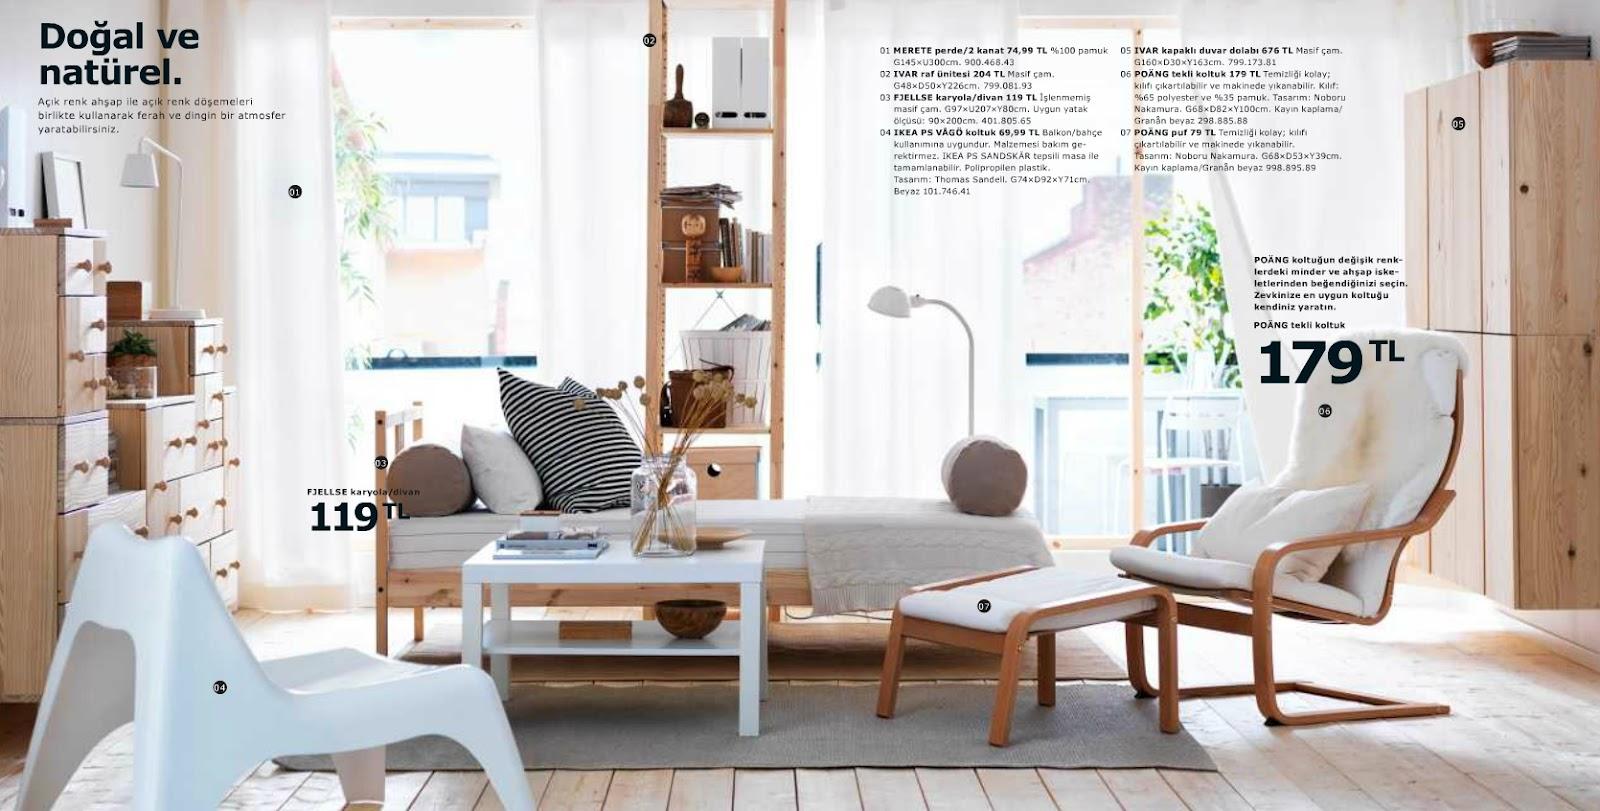 ikea furniture shop ikea furniture online ikea furniture catalog online usa tren you can now. Black Bedroom Furniture Sets. Home Design Ideas